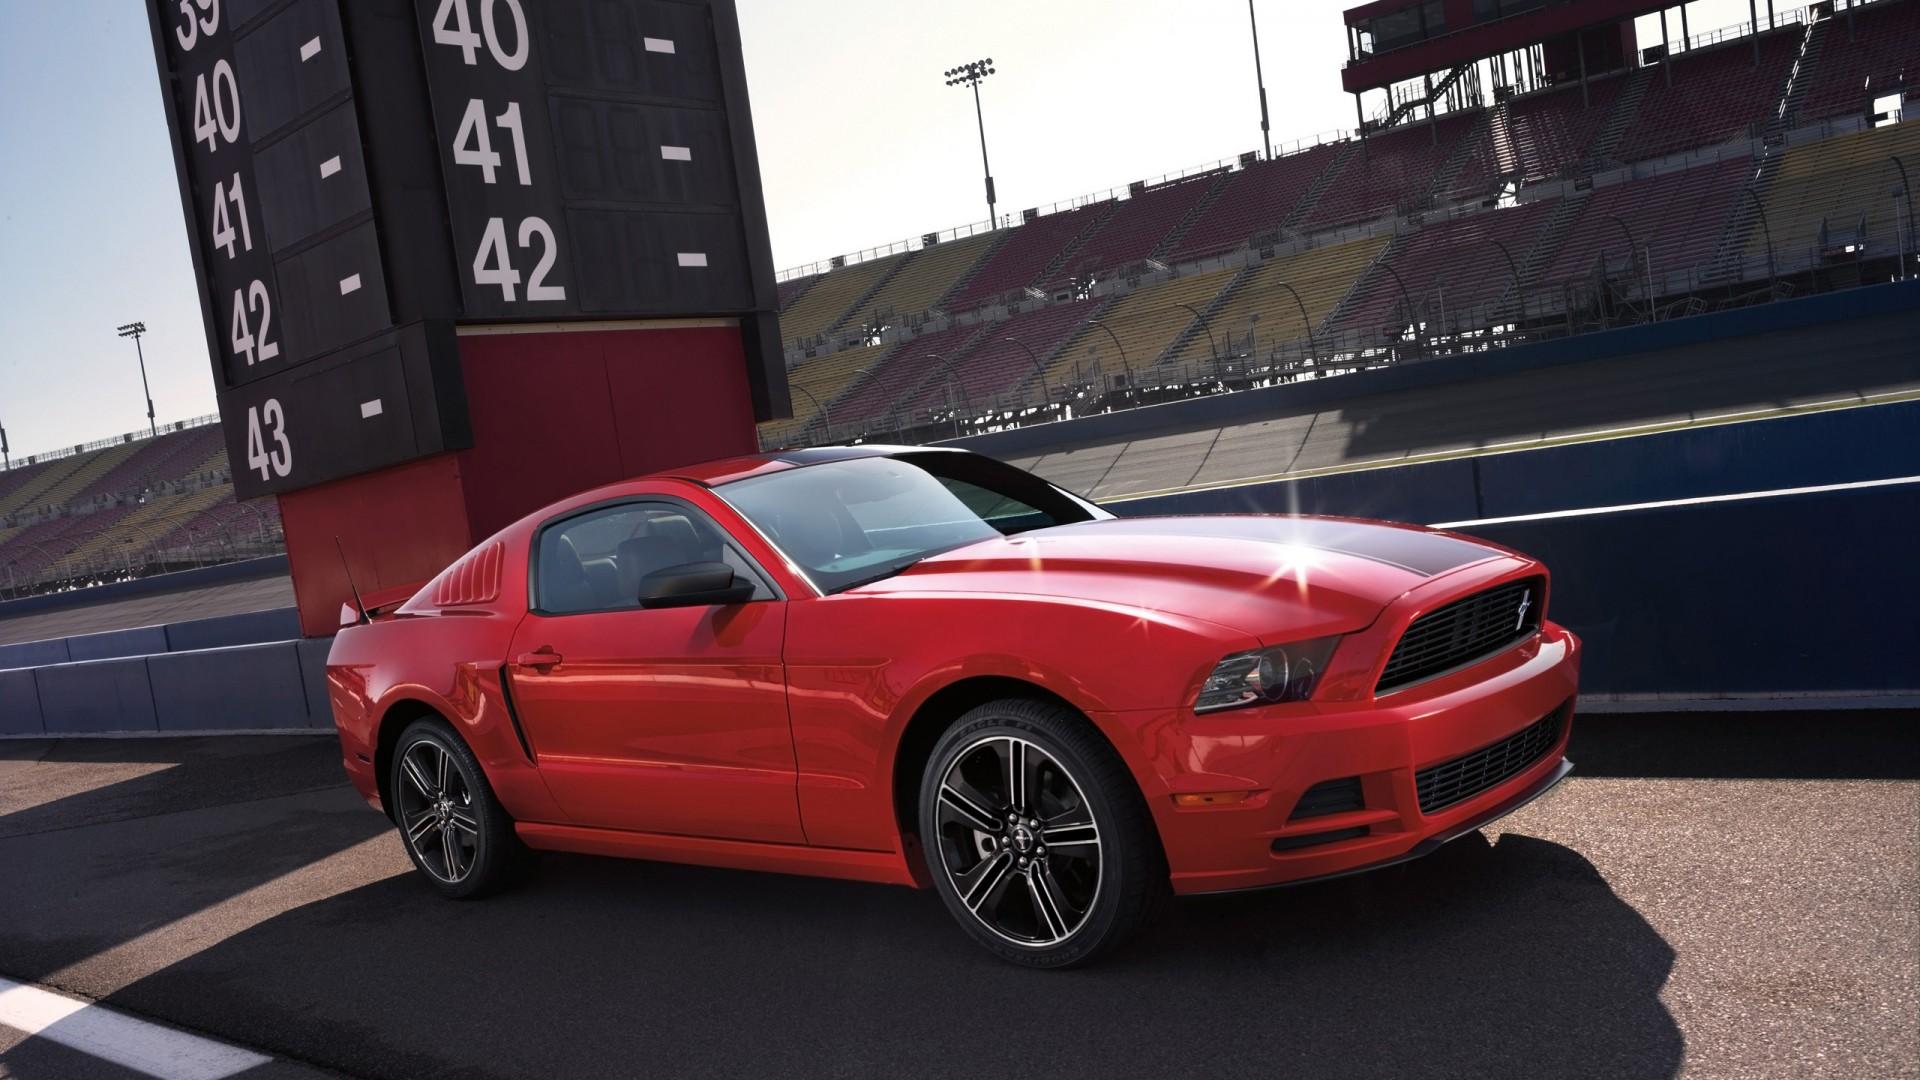 Jaguar Car Logo Hd Wallpaper Download 2014 Ford Mustang Gt Wallpaper Hd Car Wallpapers Id 3913